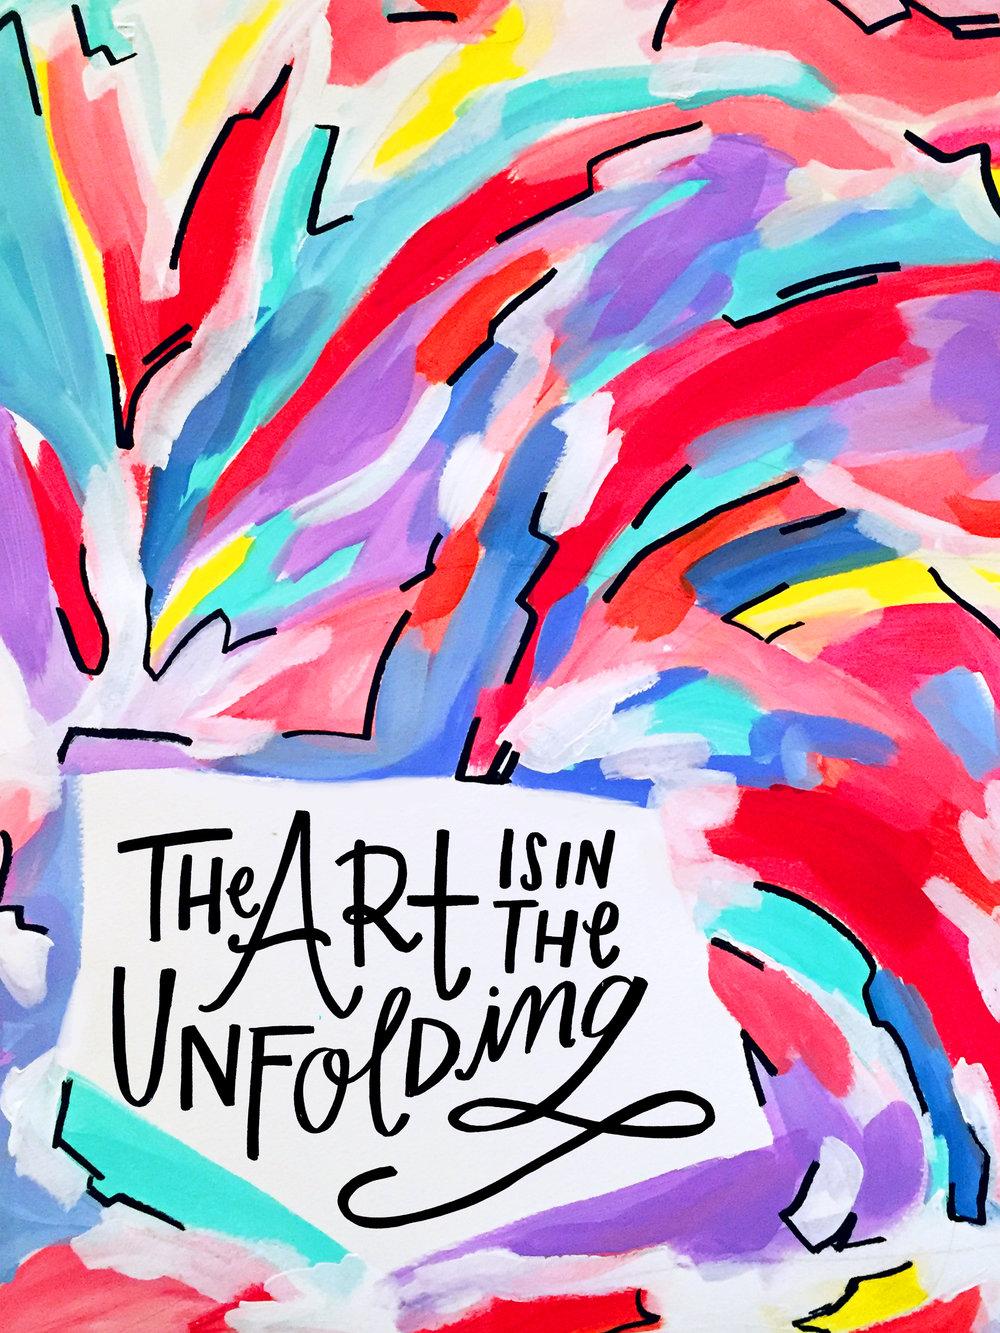 2/28/16: Unfolding